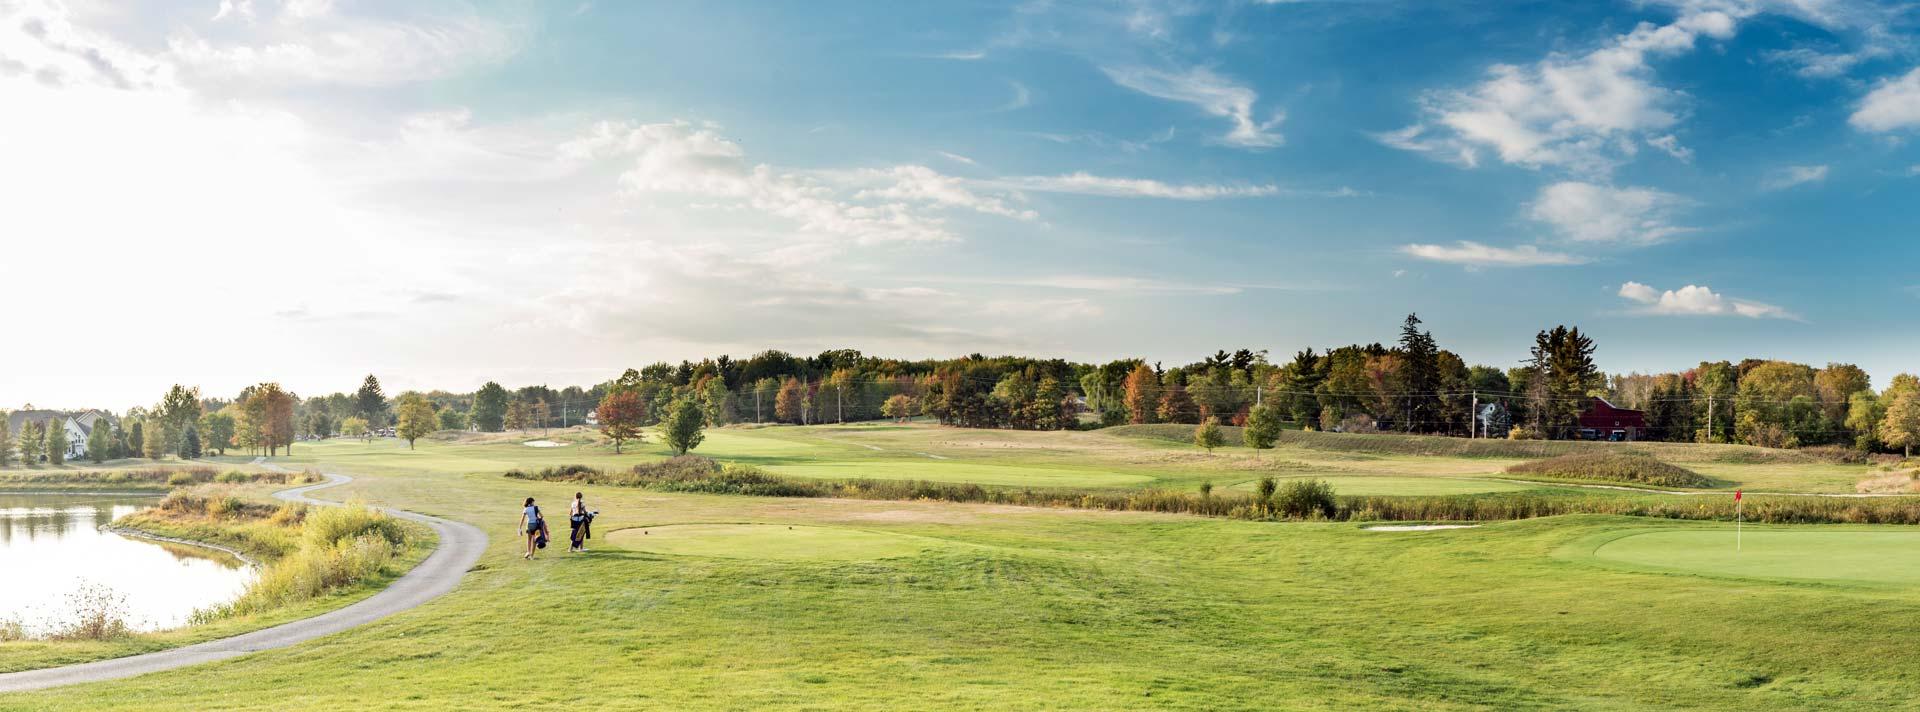 A panoramic of Briarwood Golf Club, Broadview Heights Ohio